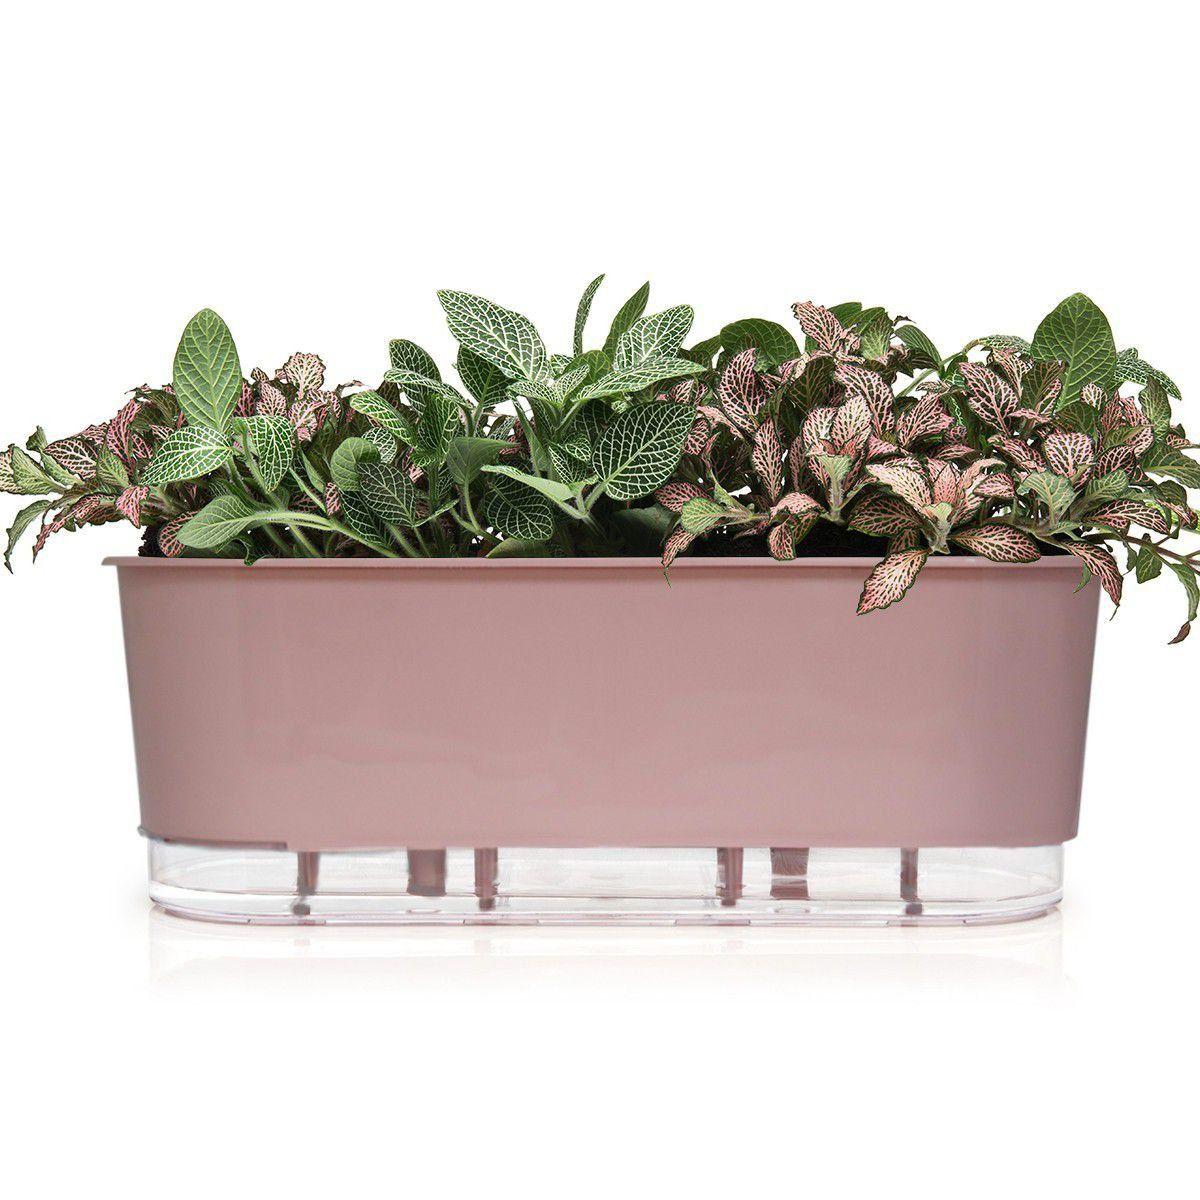 Vaso Autoirrigável Jardineira Rosa Quartzo 40cm Raiz